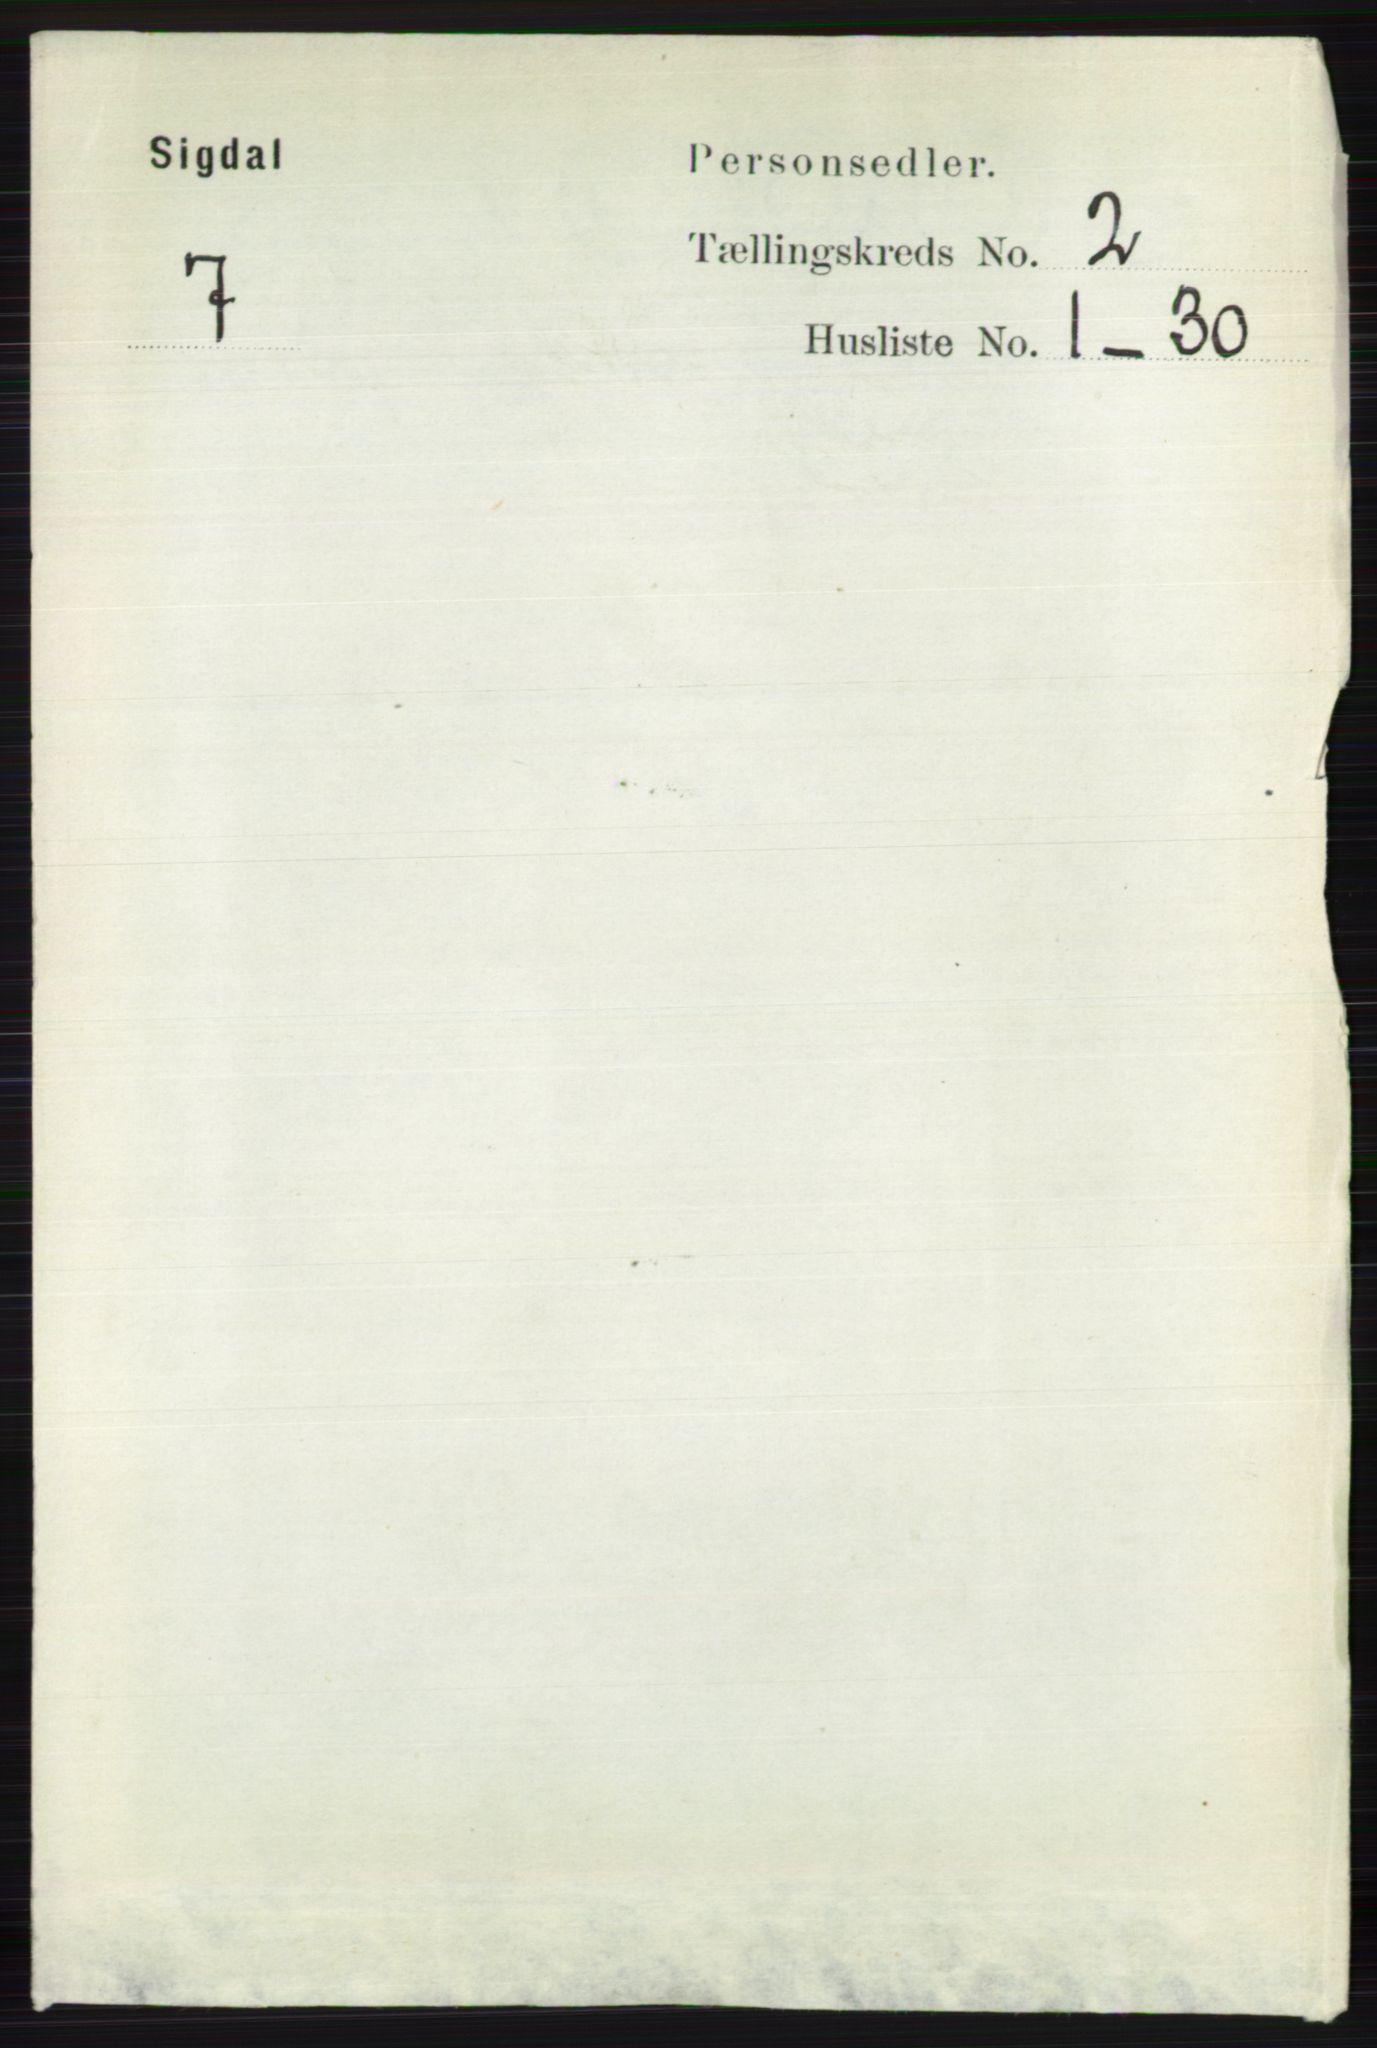 RA, Folketelling 1891 for 0621 Sigdal herred, 1891, s. 953